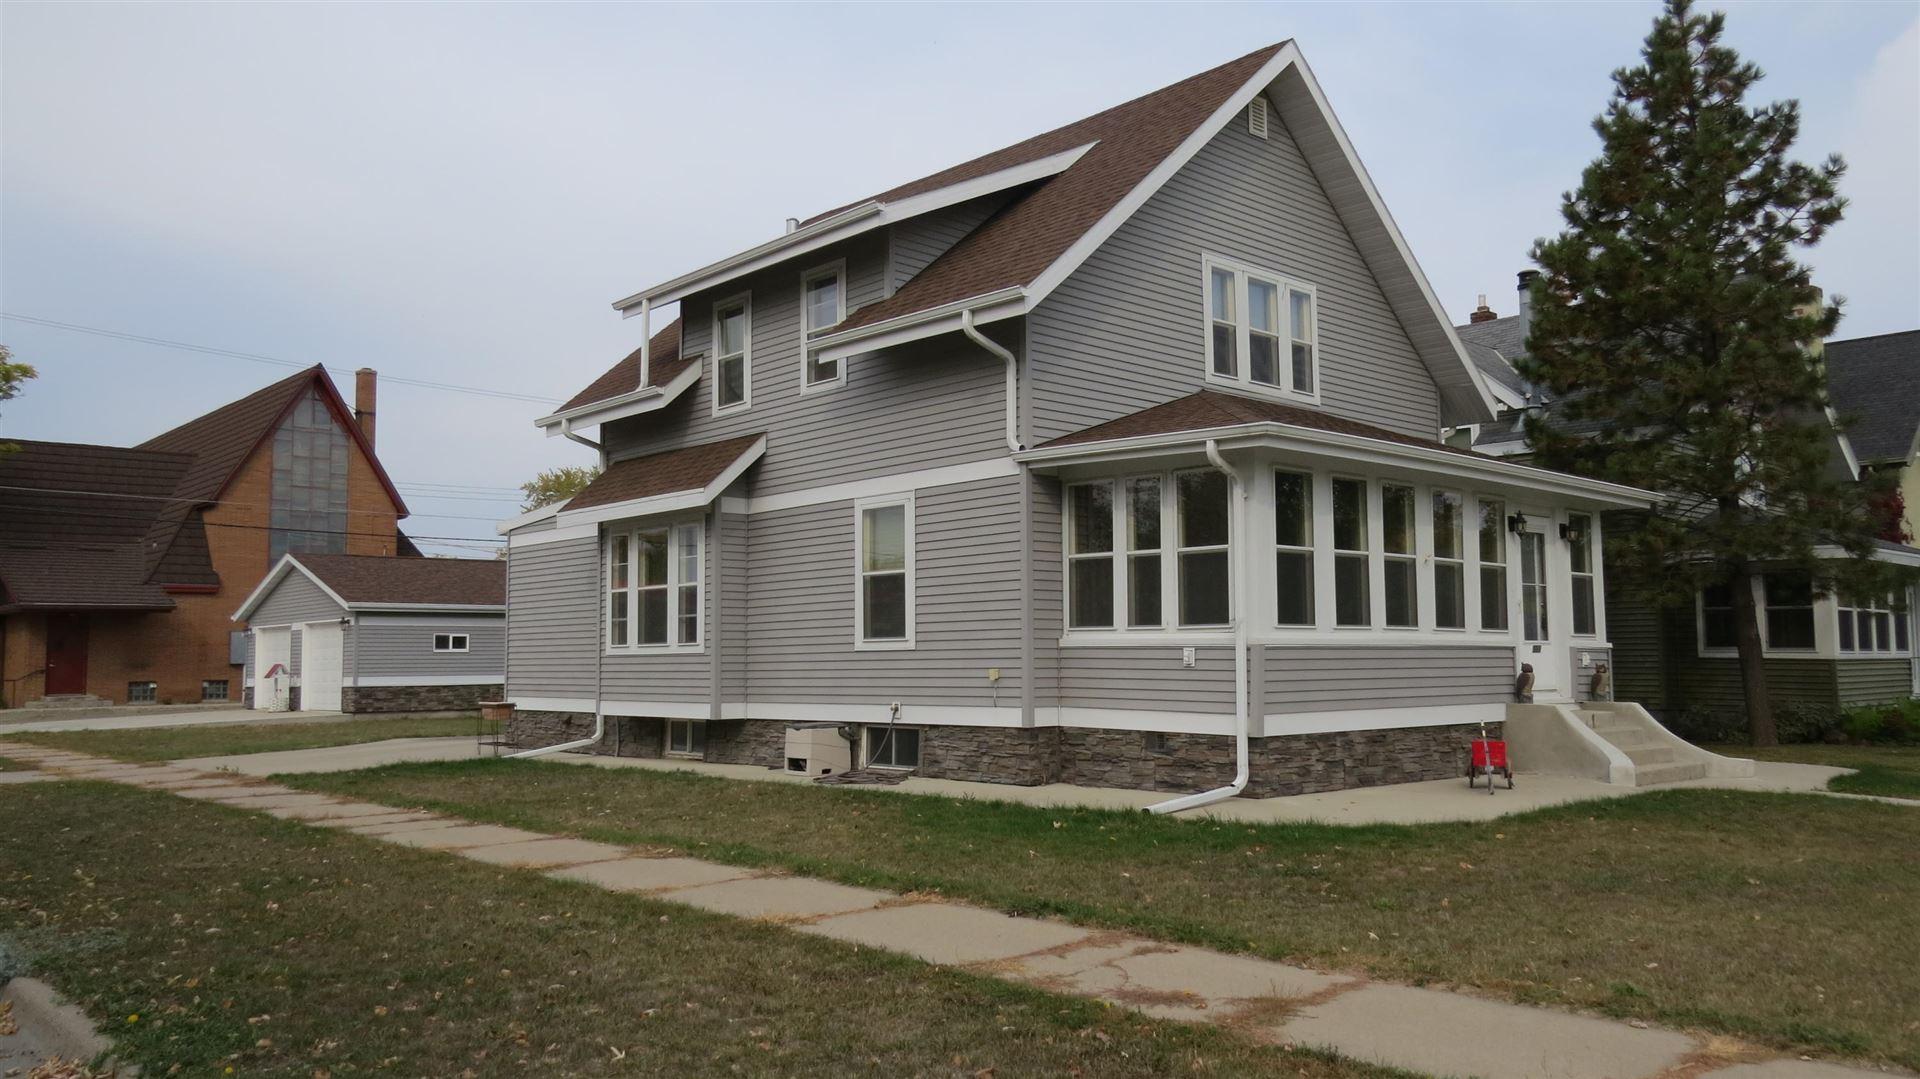 Photo for 501 2nd Avenue NE, Jamestown, ND 58401 (MLS # 20-558)